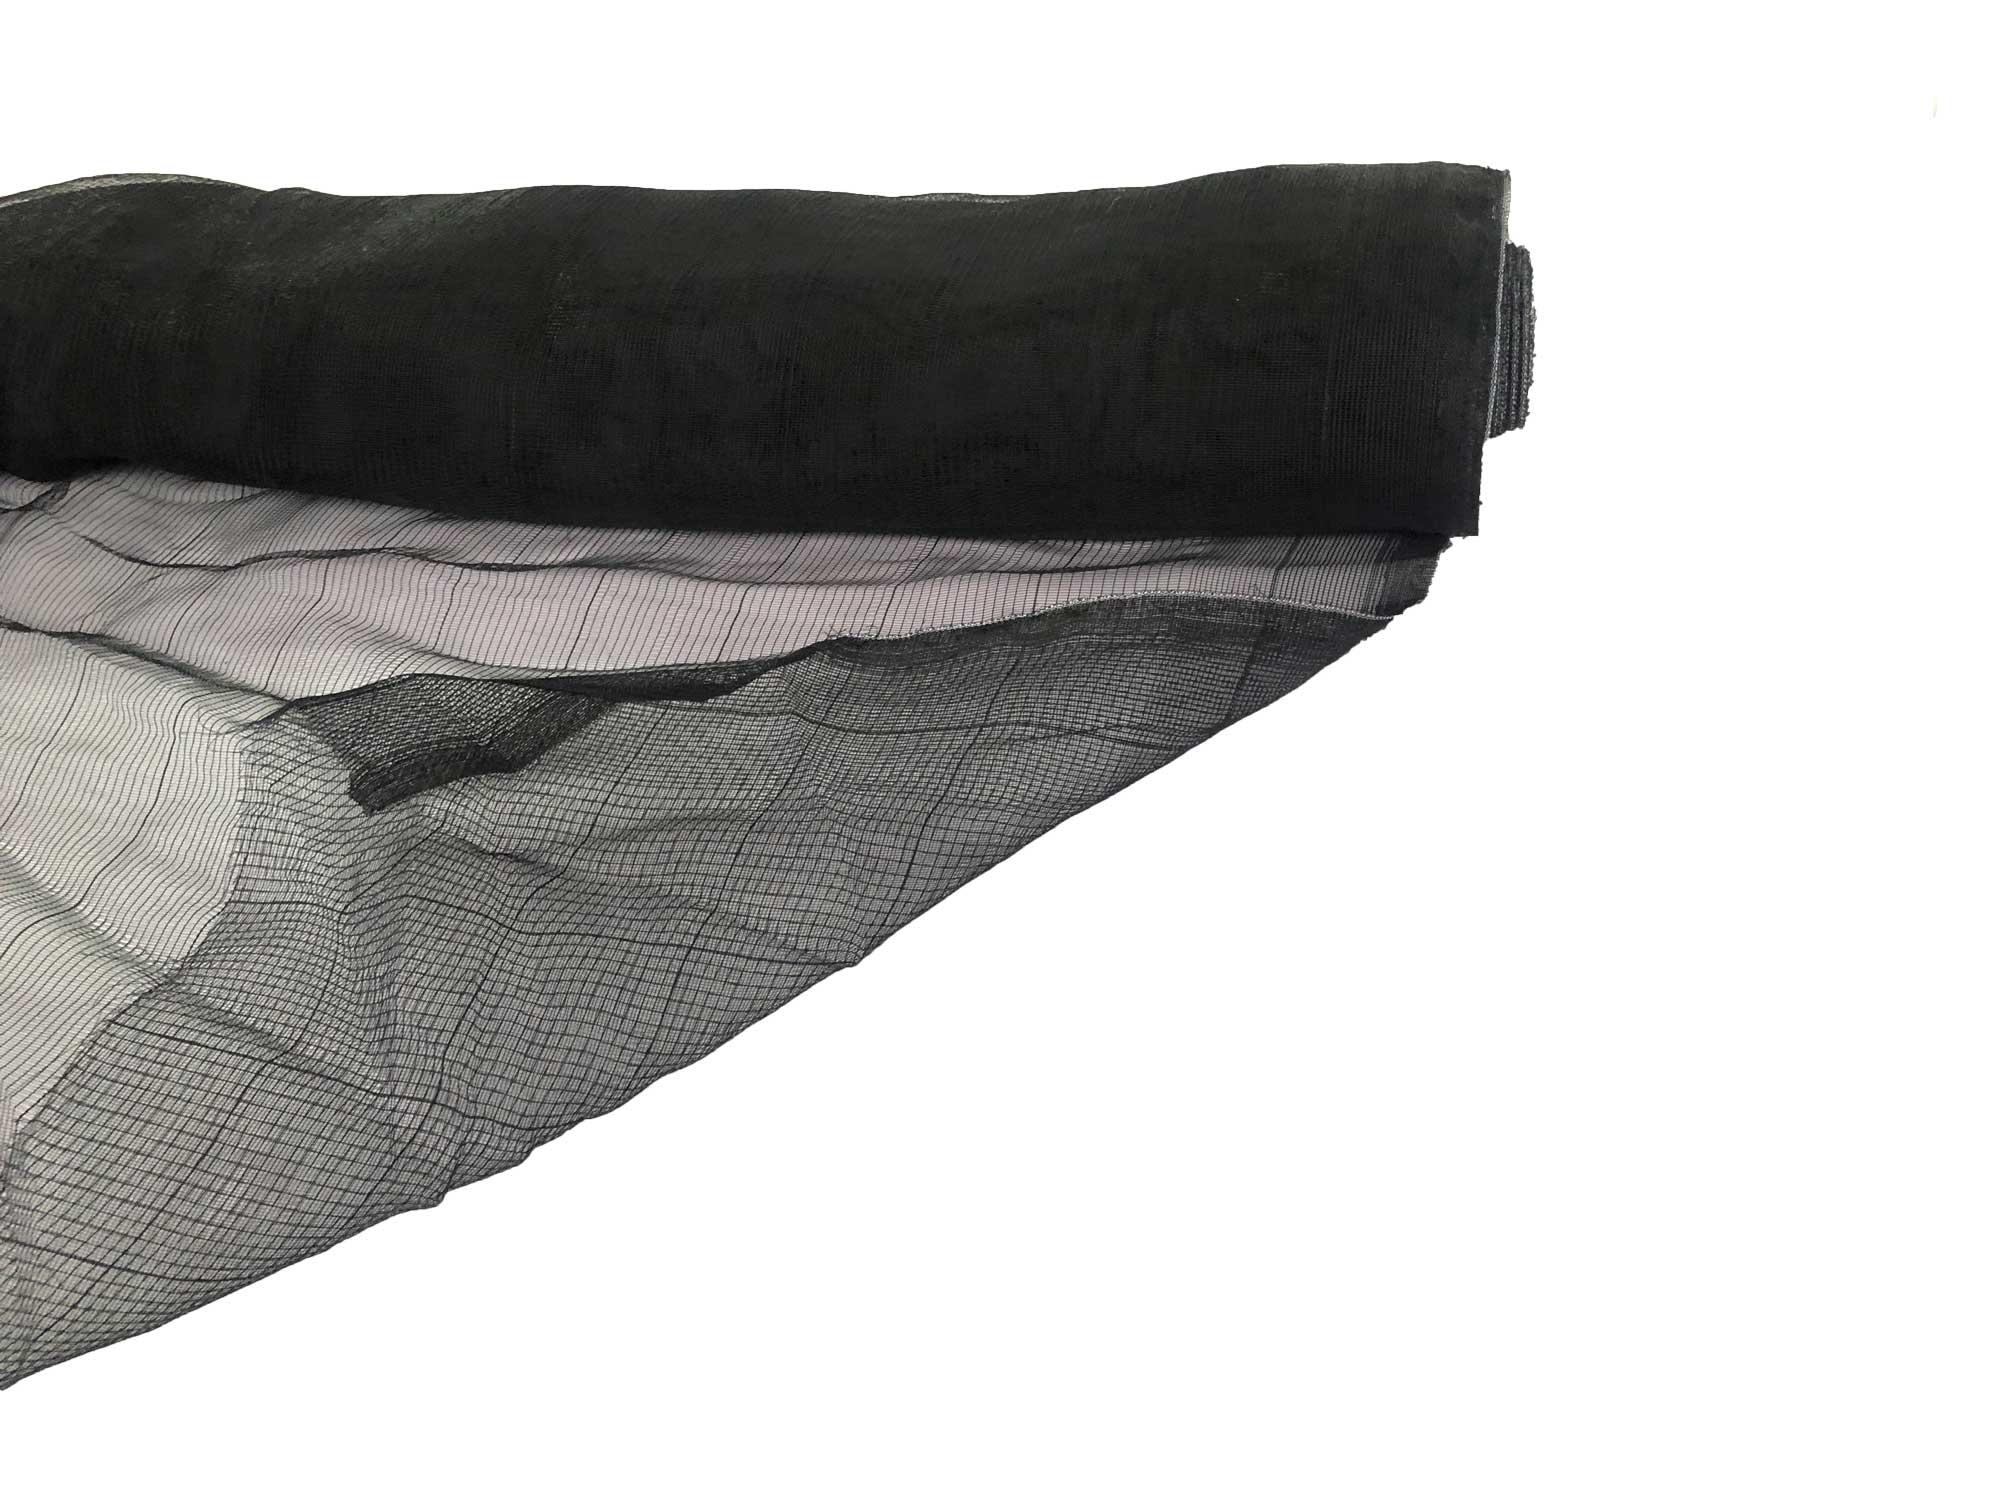 Tela Sombrite Nylon Monofilamento com Giro Inglês 50% 3x15